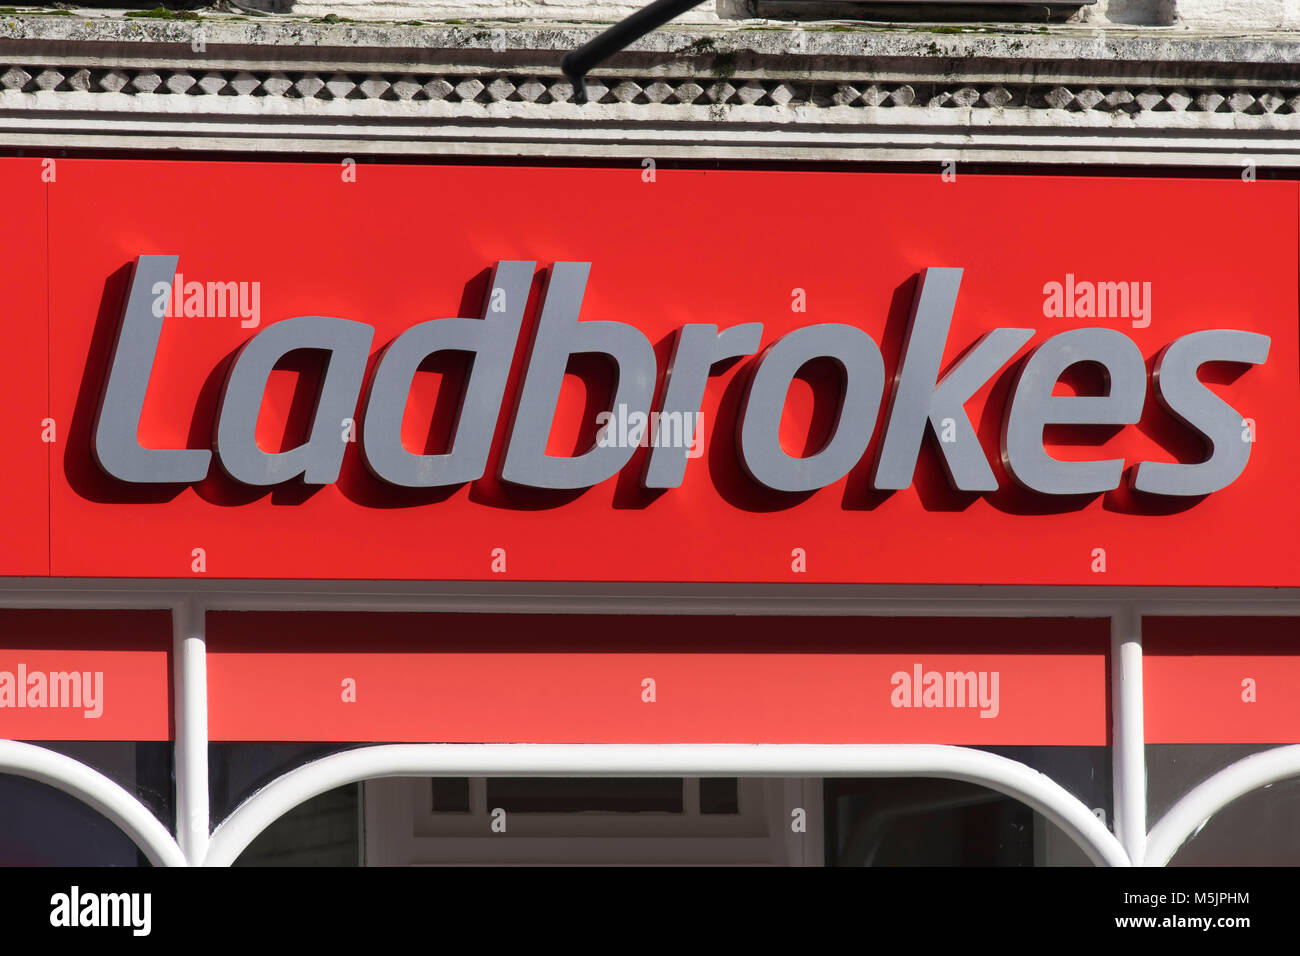 Ladbrokes Logo Stock Photos & Ladbrokes Logo Stock Images